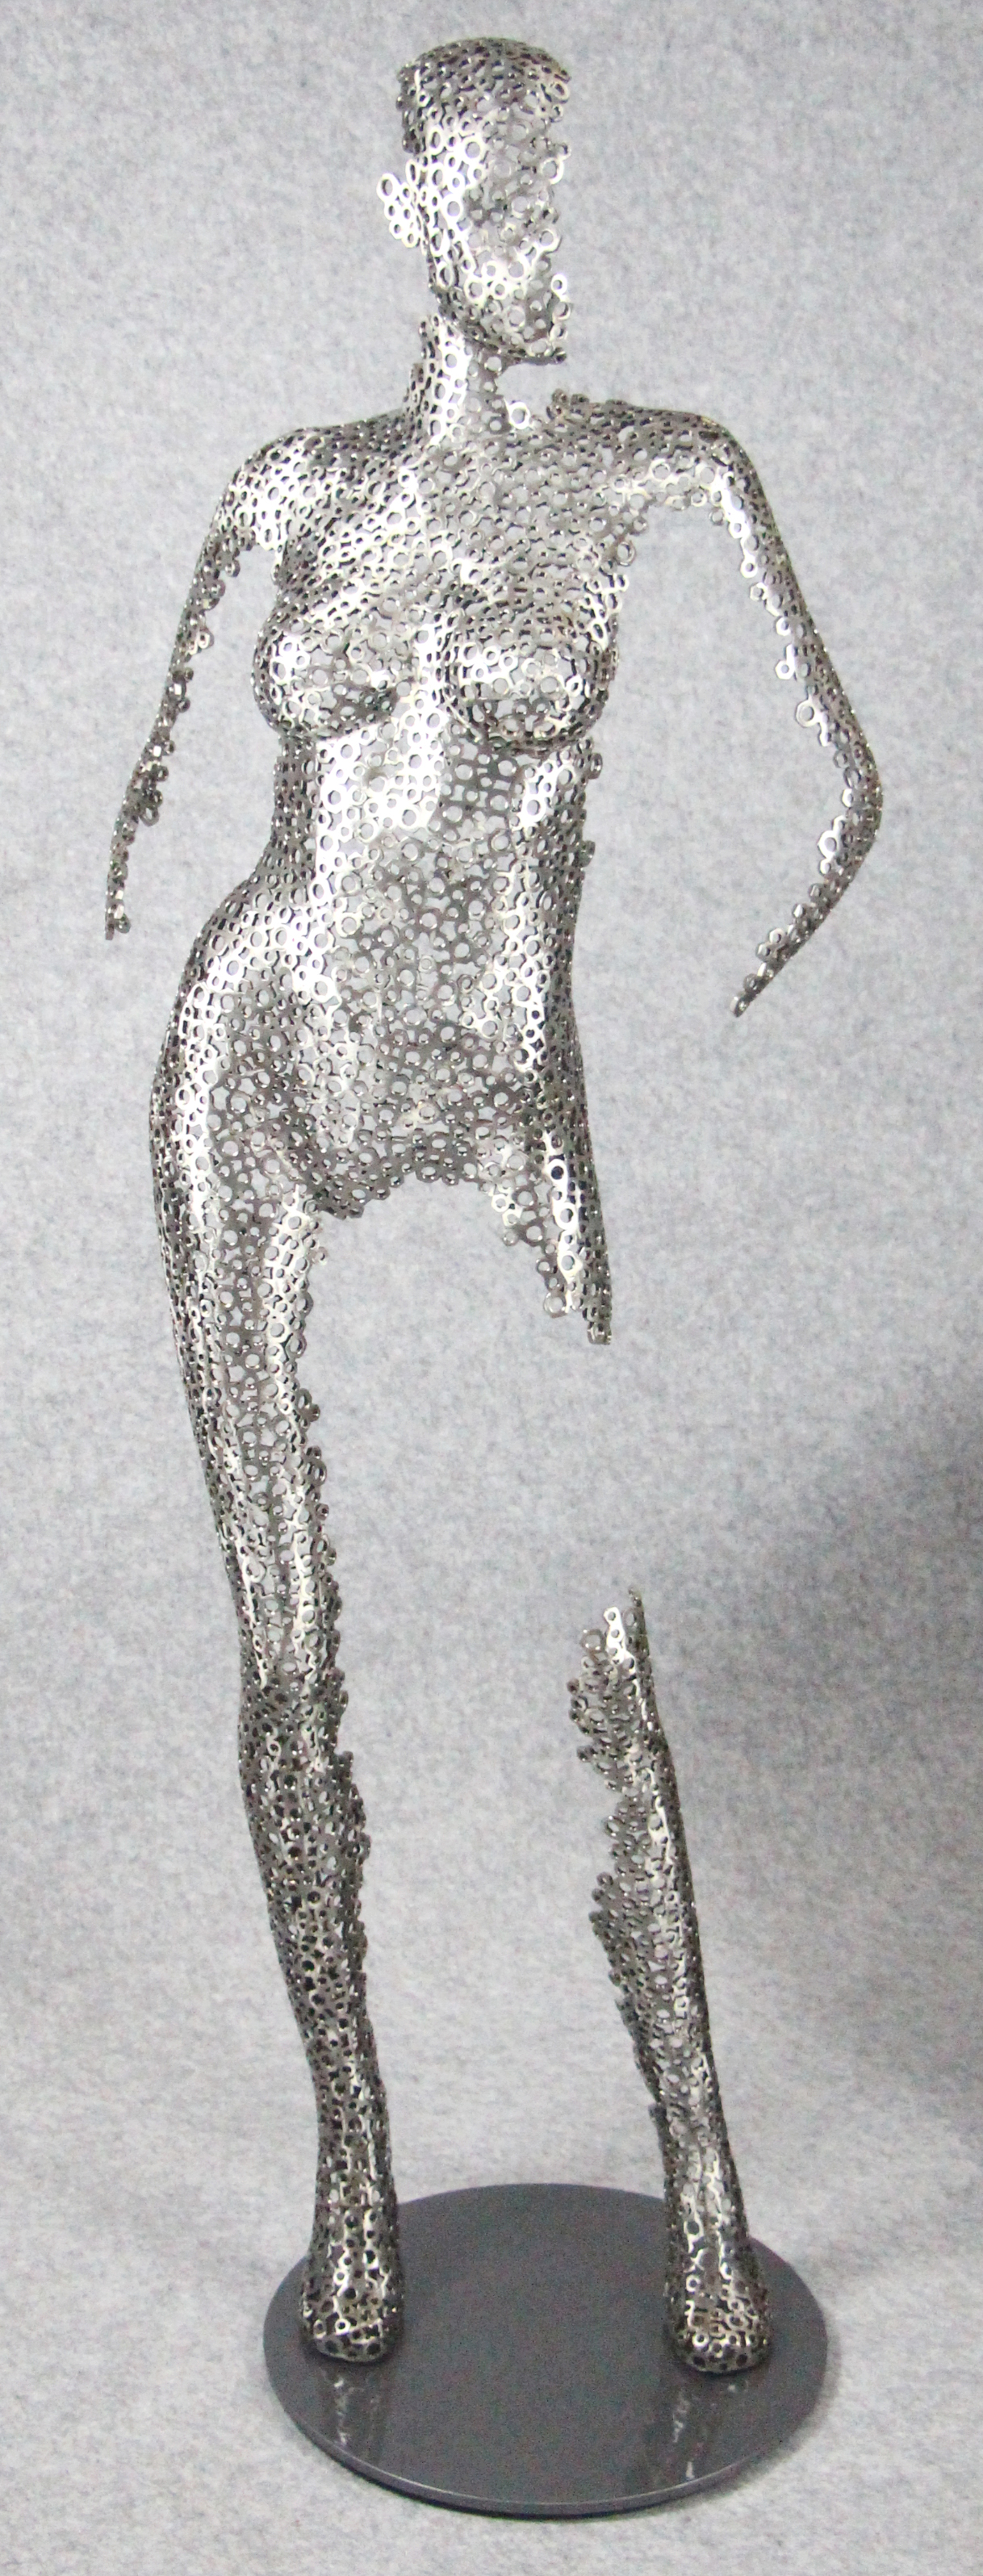 VYKI - Elegance (Silver) , 4506-011-038